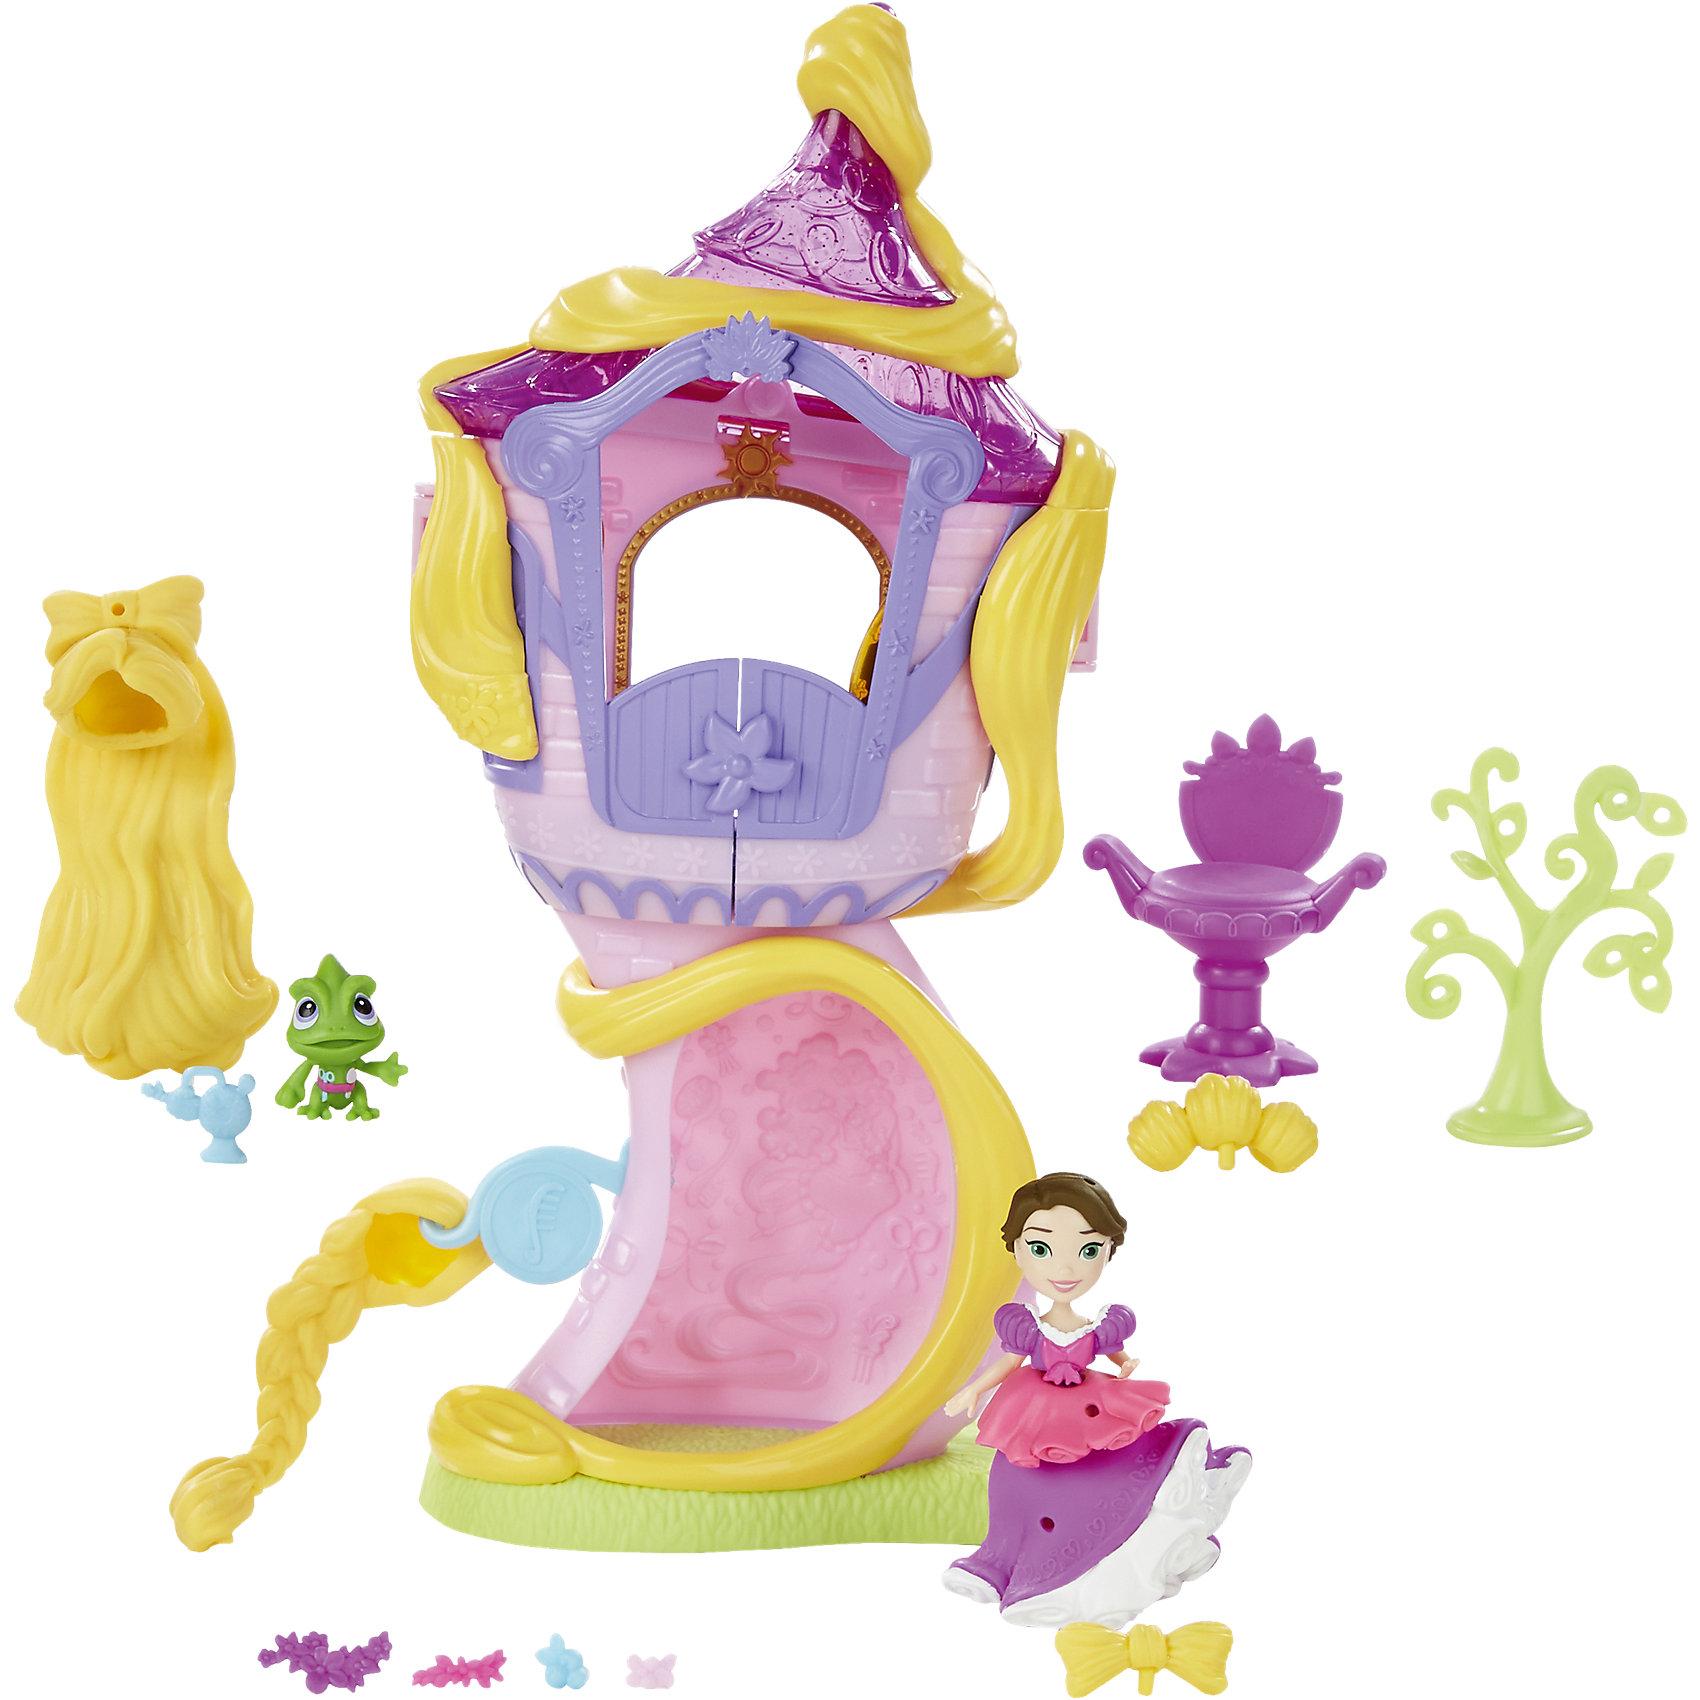 Hasbro Набор Башня Рапунцель, Disney Princess hasbro hasbro кукла disney princess рапунцель с модной прической